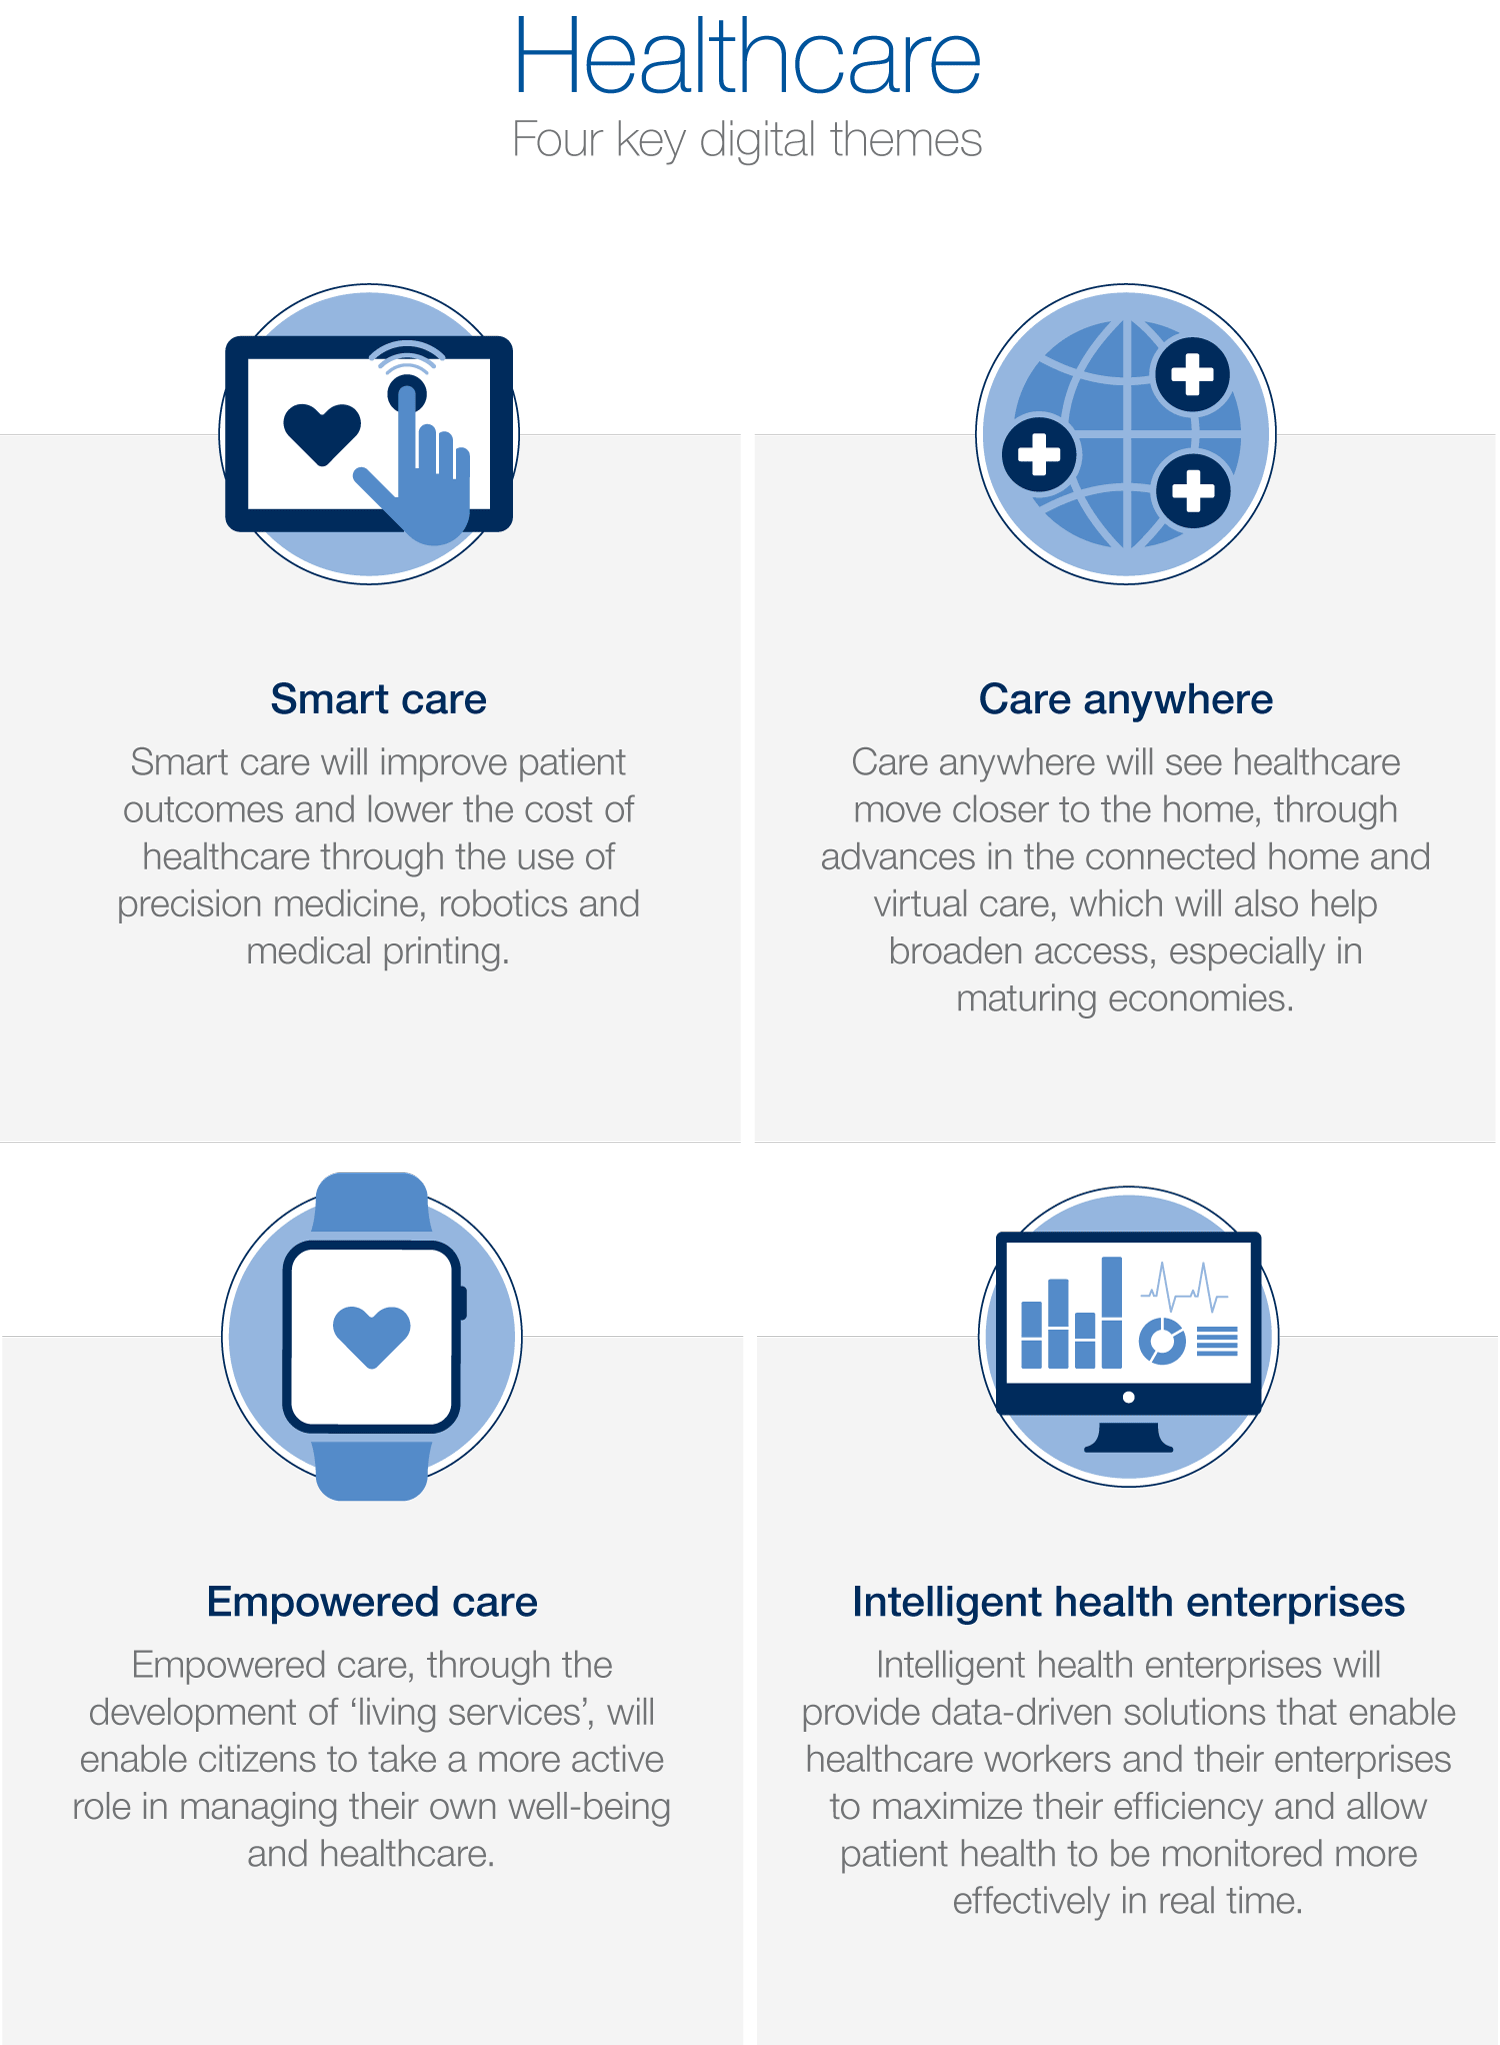 Pin By Benjamin Sefoka On The Digitization Of Health Care Virtual Care Health Care Healthcare System